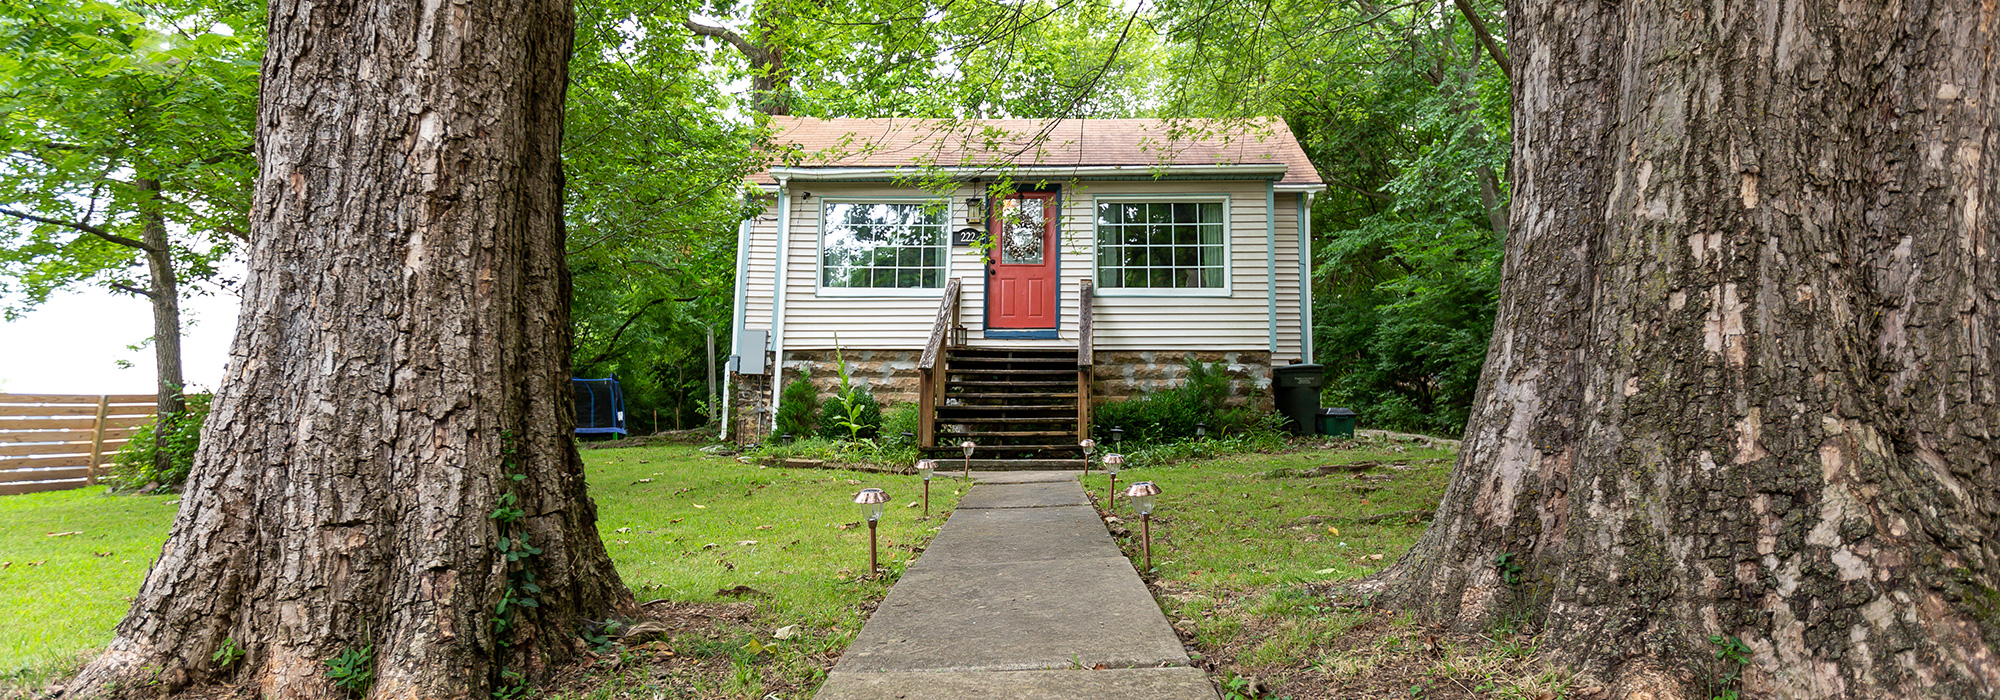 222 Mill Ave, Fayetteville, AR 72701